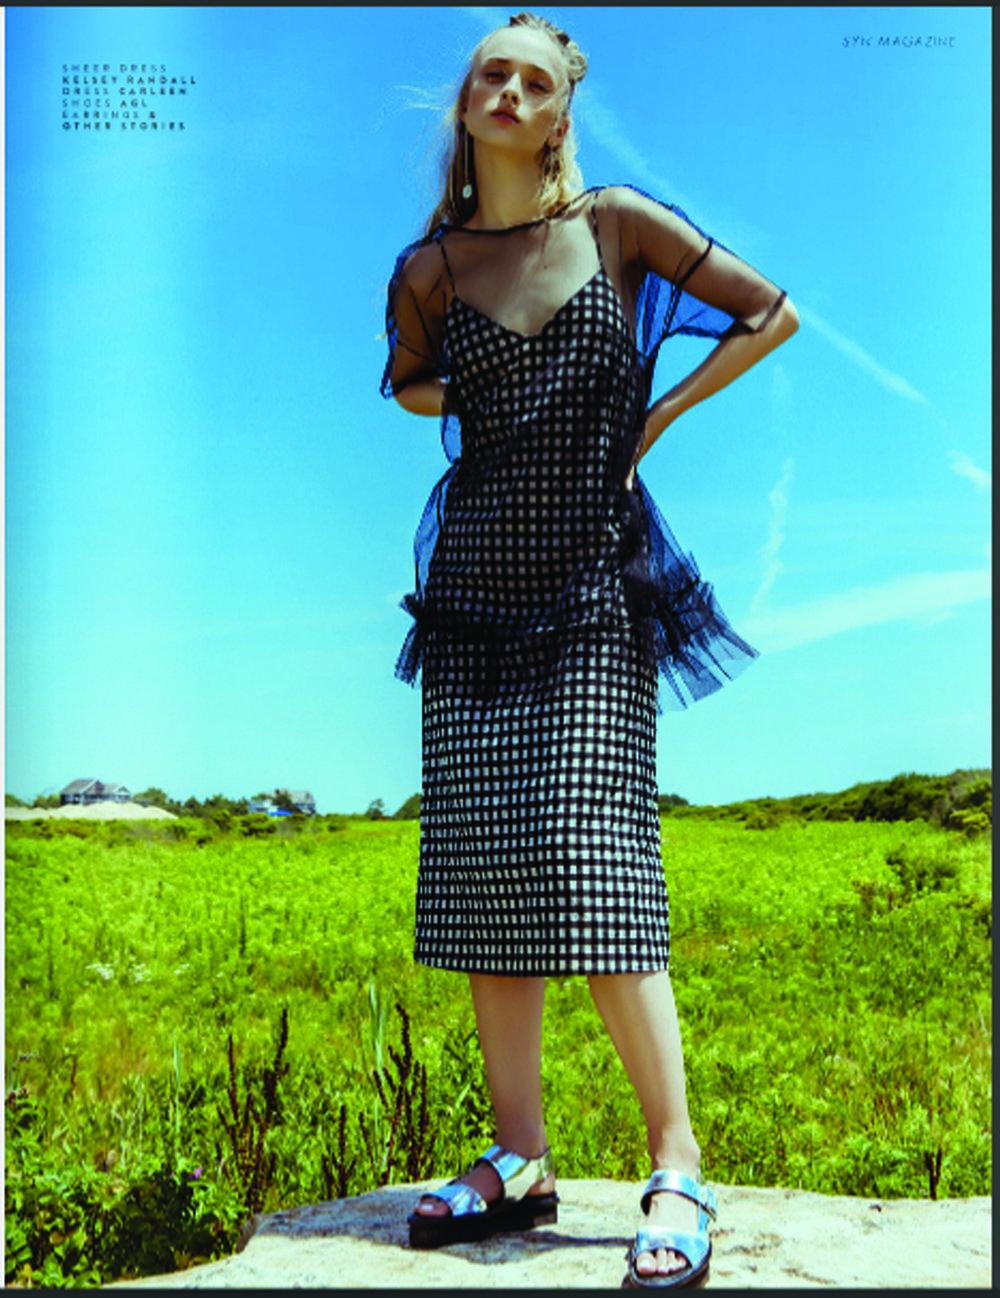 syn magazine kelsey randall black tulle babydoll dress sheer baby doll short sleeve ruffle gem gingham check